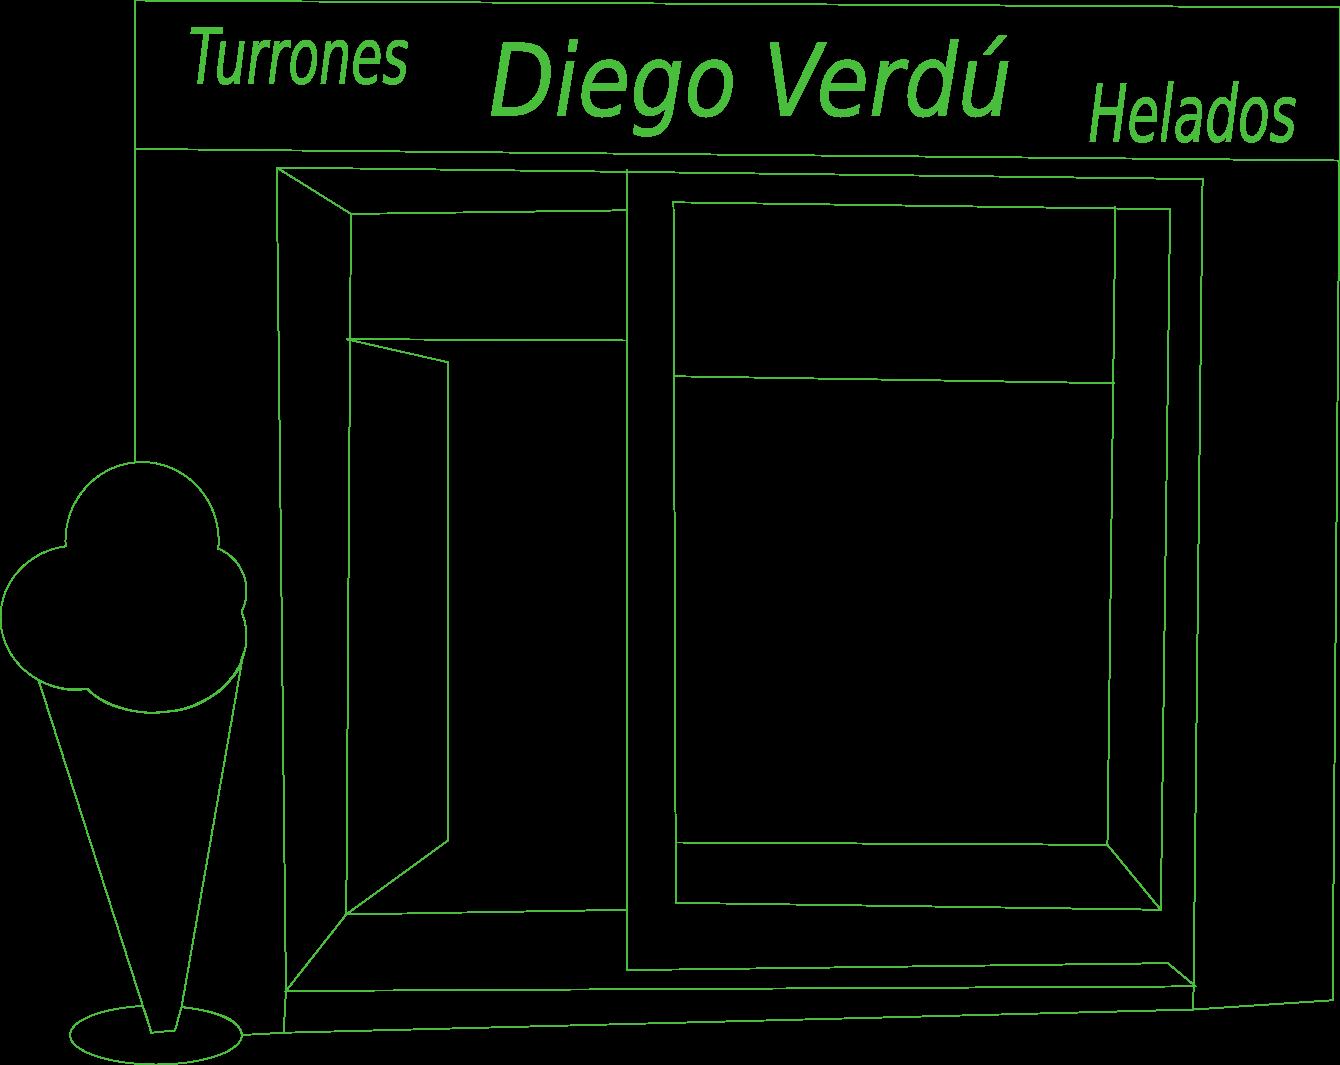 Diego Verdú